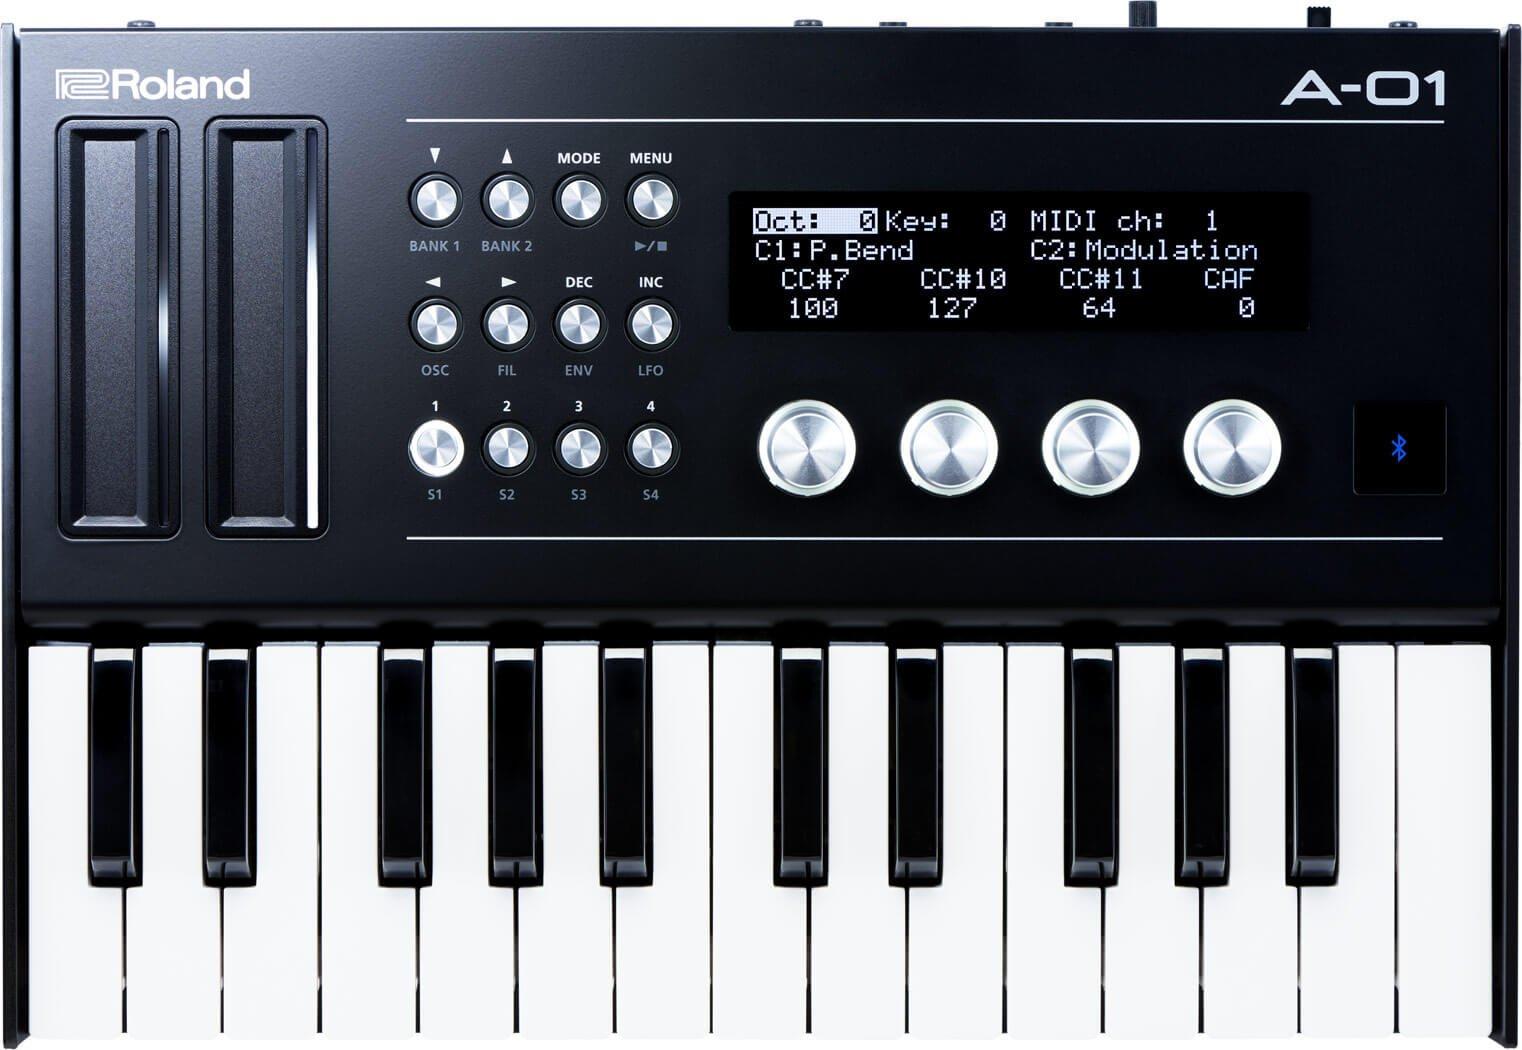 Roland A 01 Midi Controller Amp Sound Generator Introduced